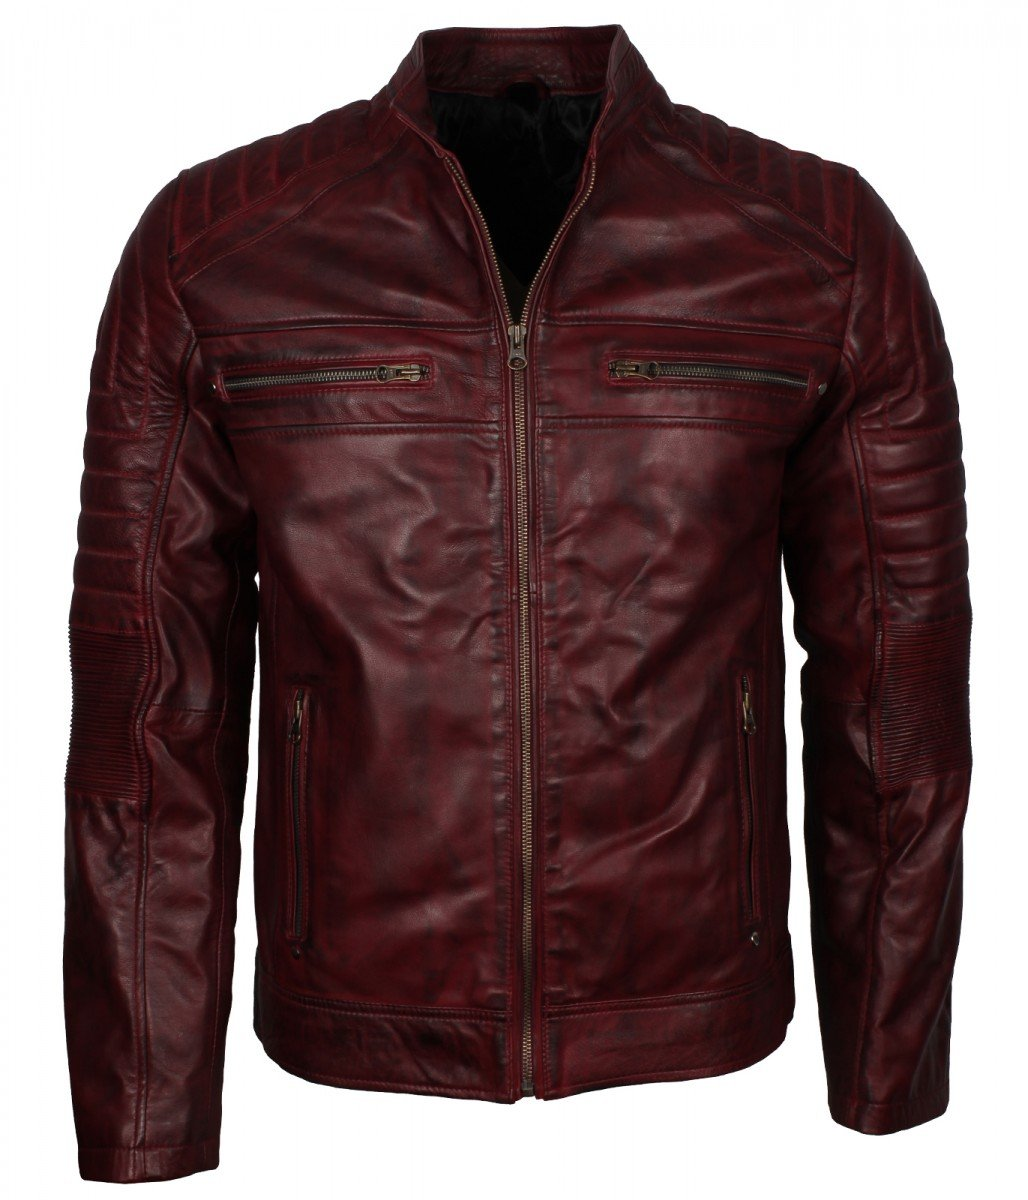 Waxed Genuine Sheepskin Leather Maroon Cafe Racer Biker Motorcycle Jacket